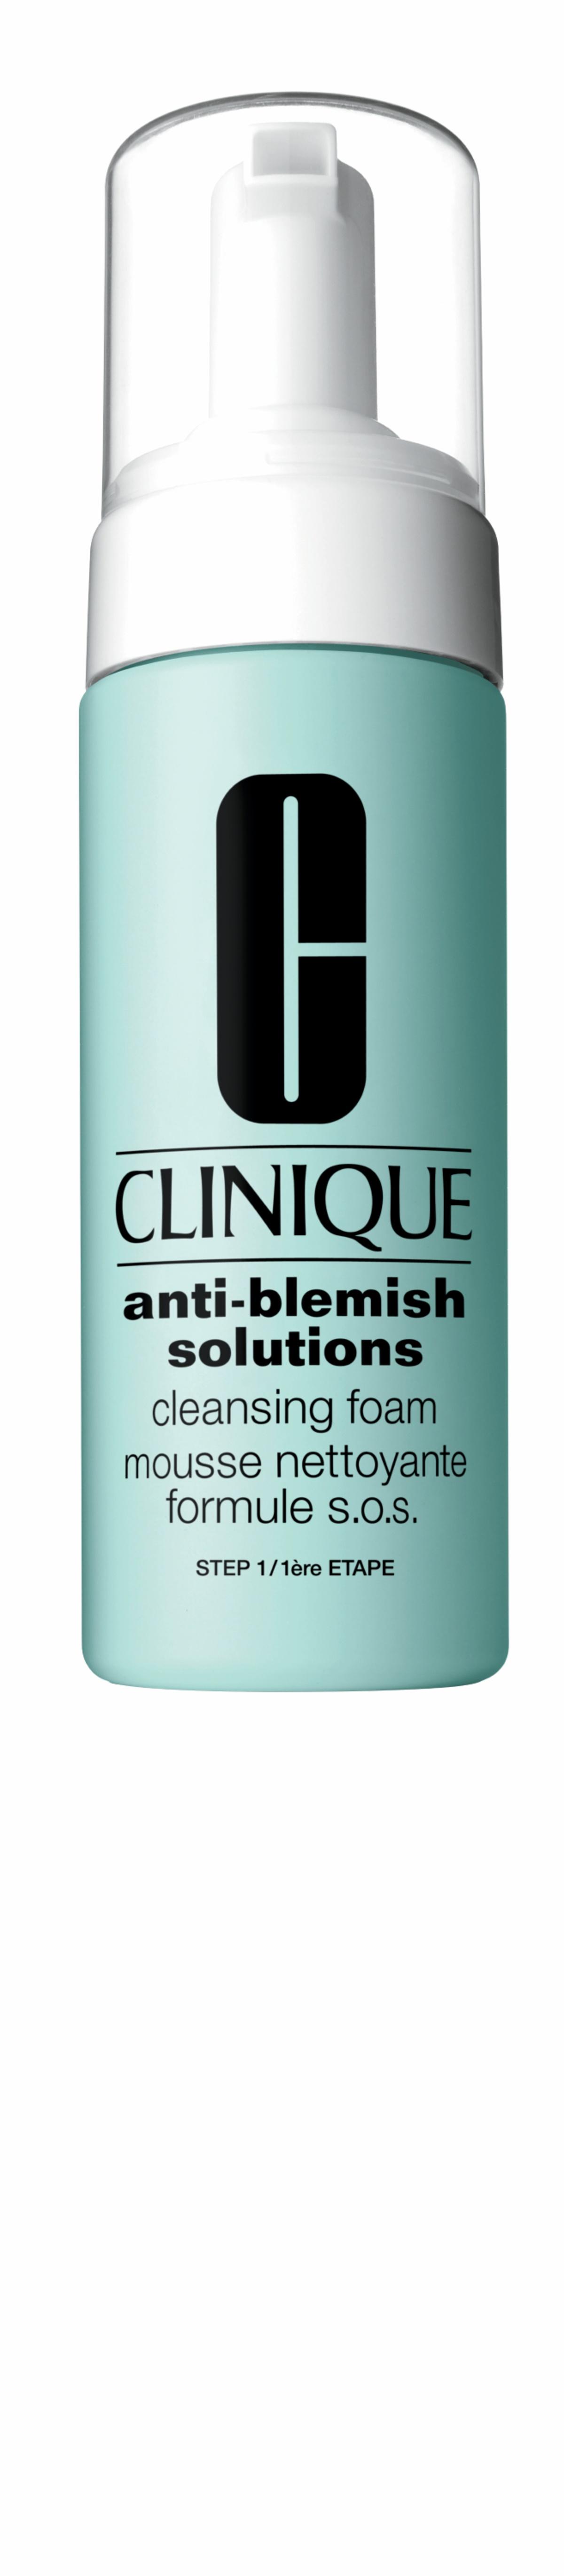 Clinique Anti-Blemish Solutions Cleansing Foam, 125 ml